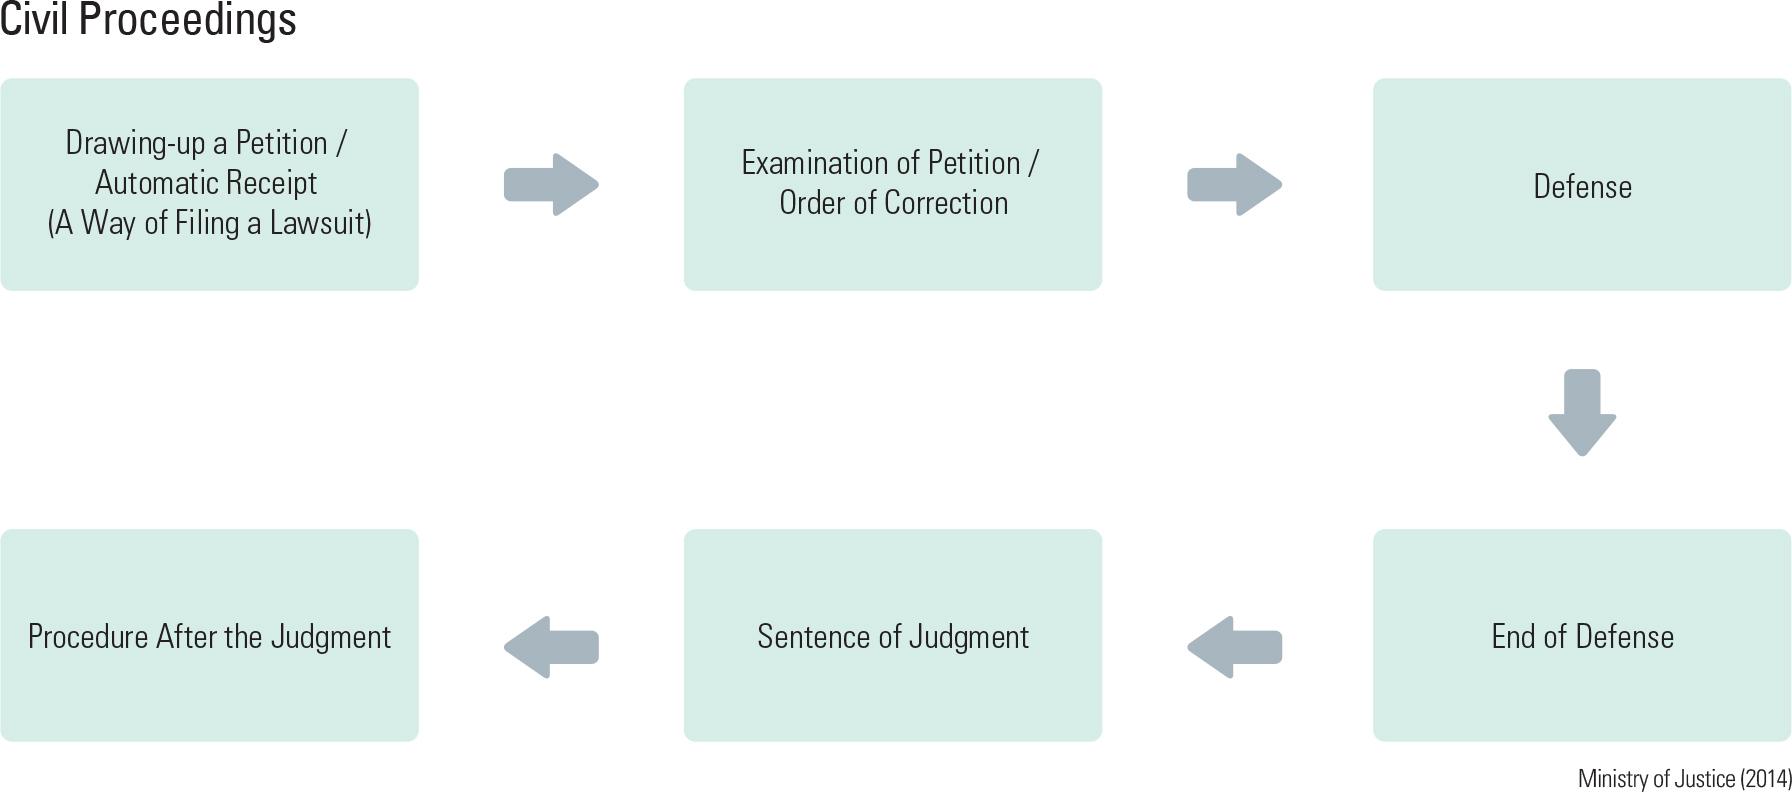 Civil Proceedings